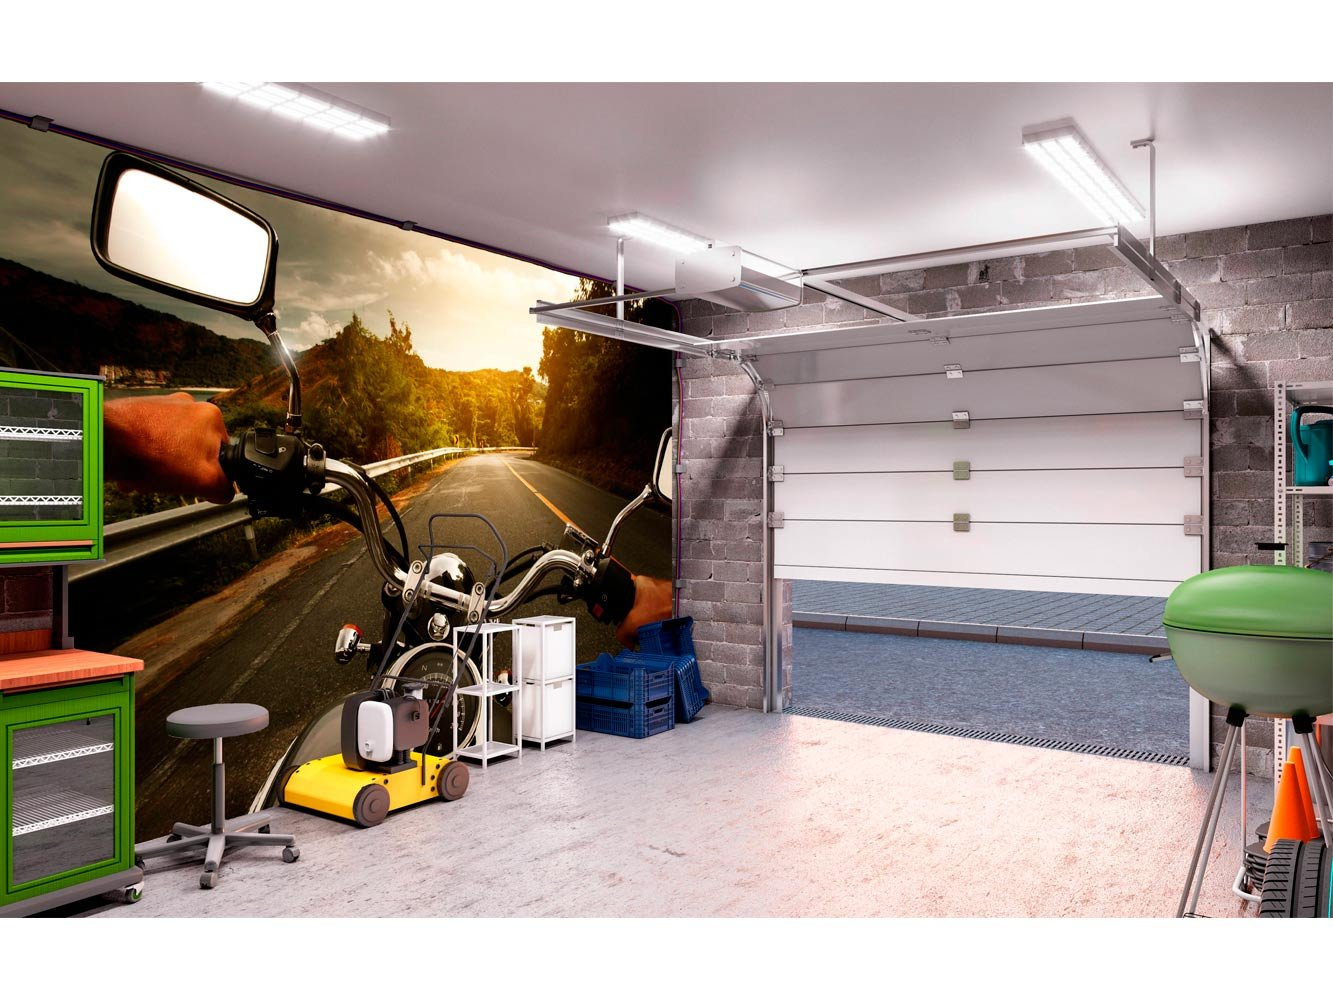 Fotomural para paredes salones Papel Pintado Para Pared Moto Paisaje Carretera Decoraci/ón comedores Varias Medidas 100 x 70 cm Mural habitaciones. Papel Pintado